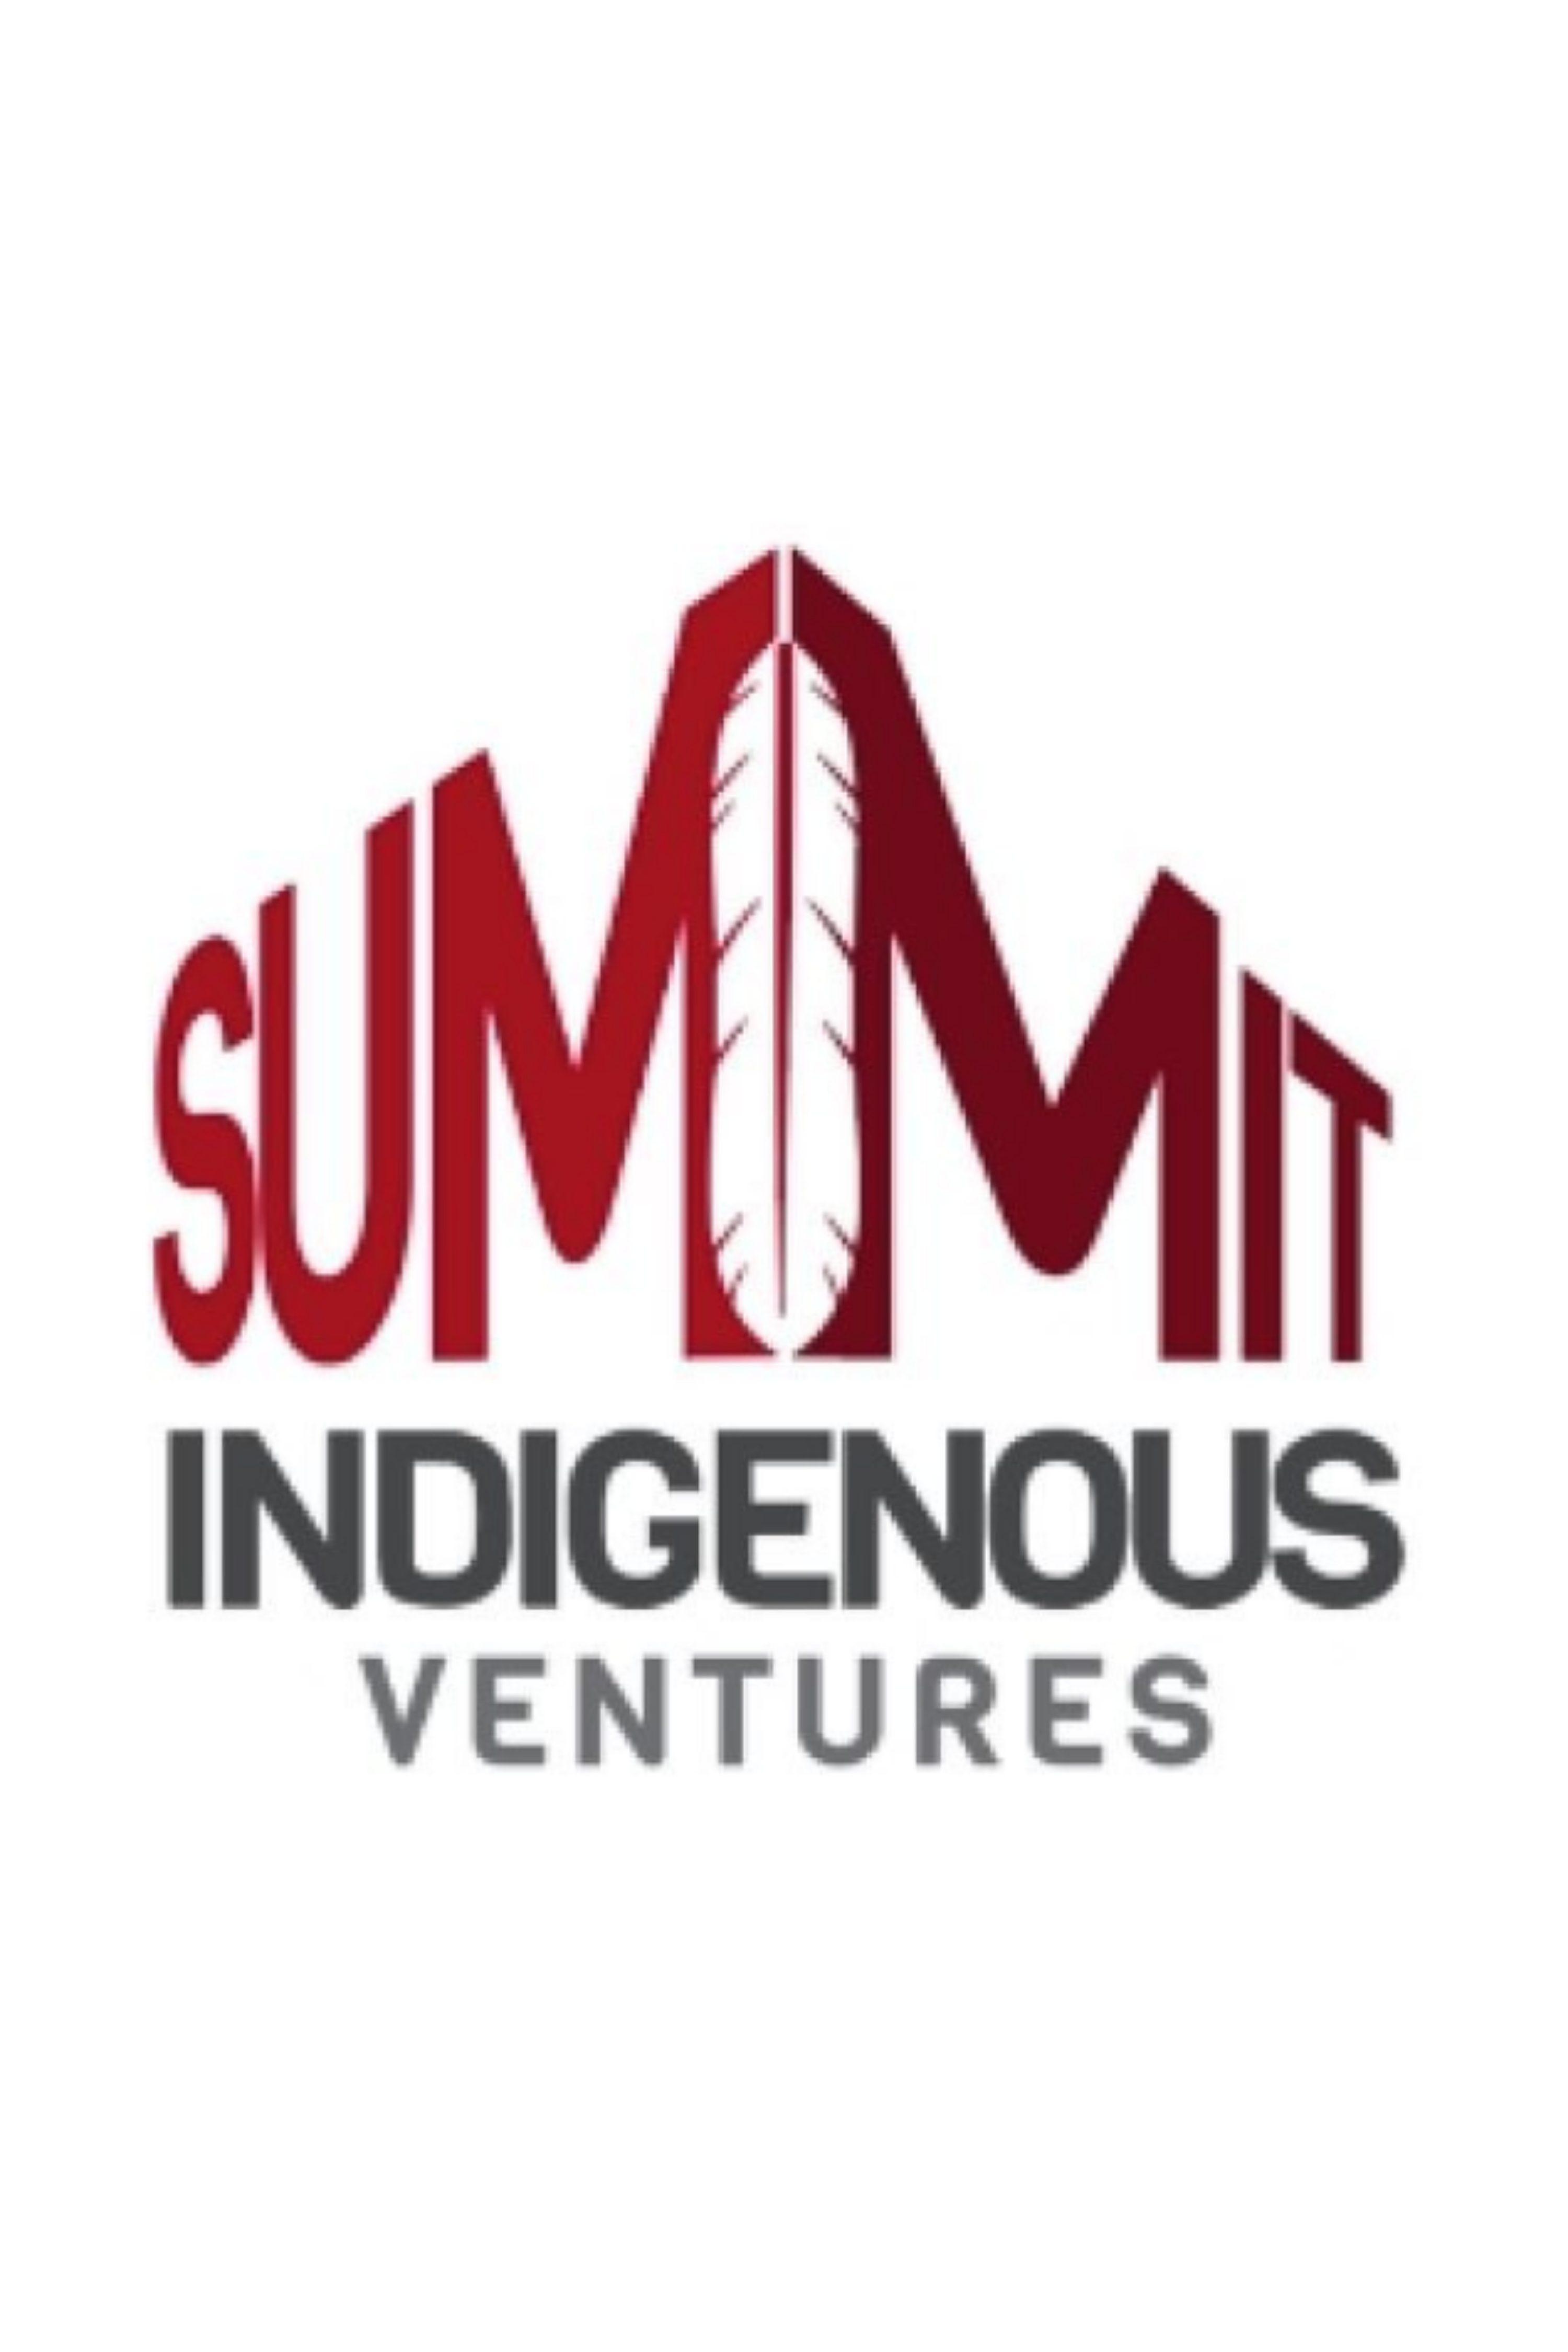 Summit Indigenous Ventures (1)